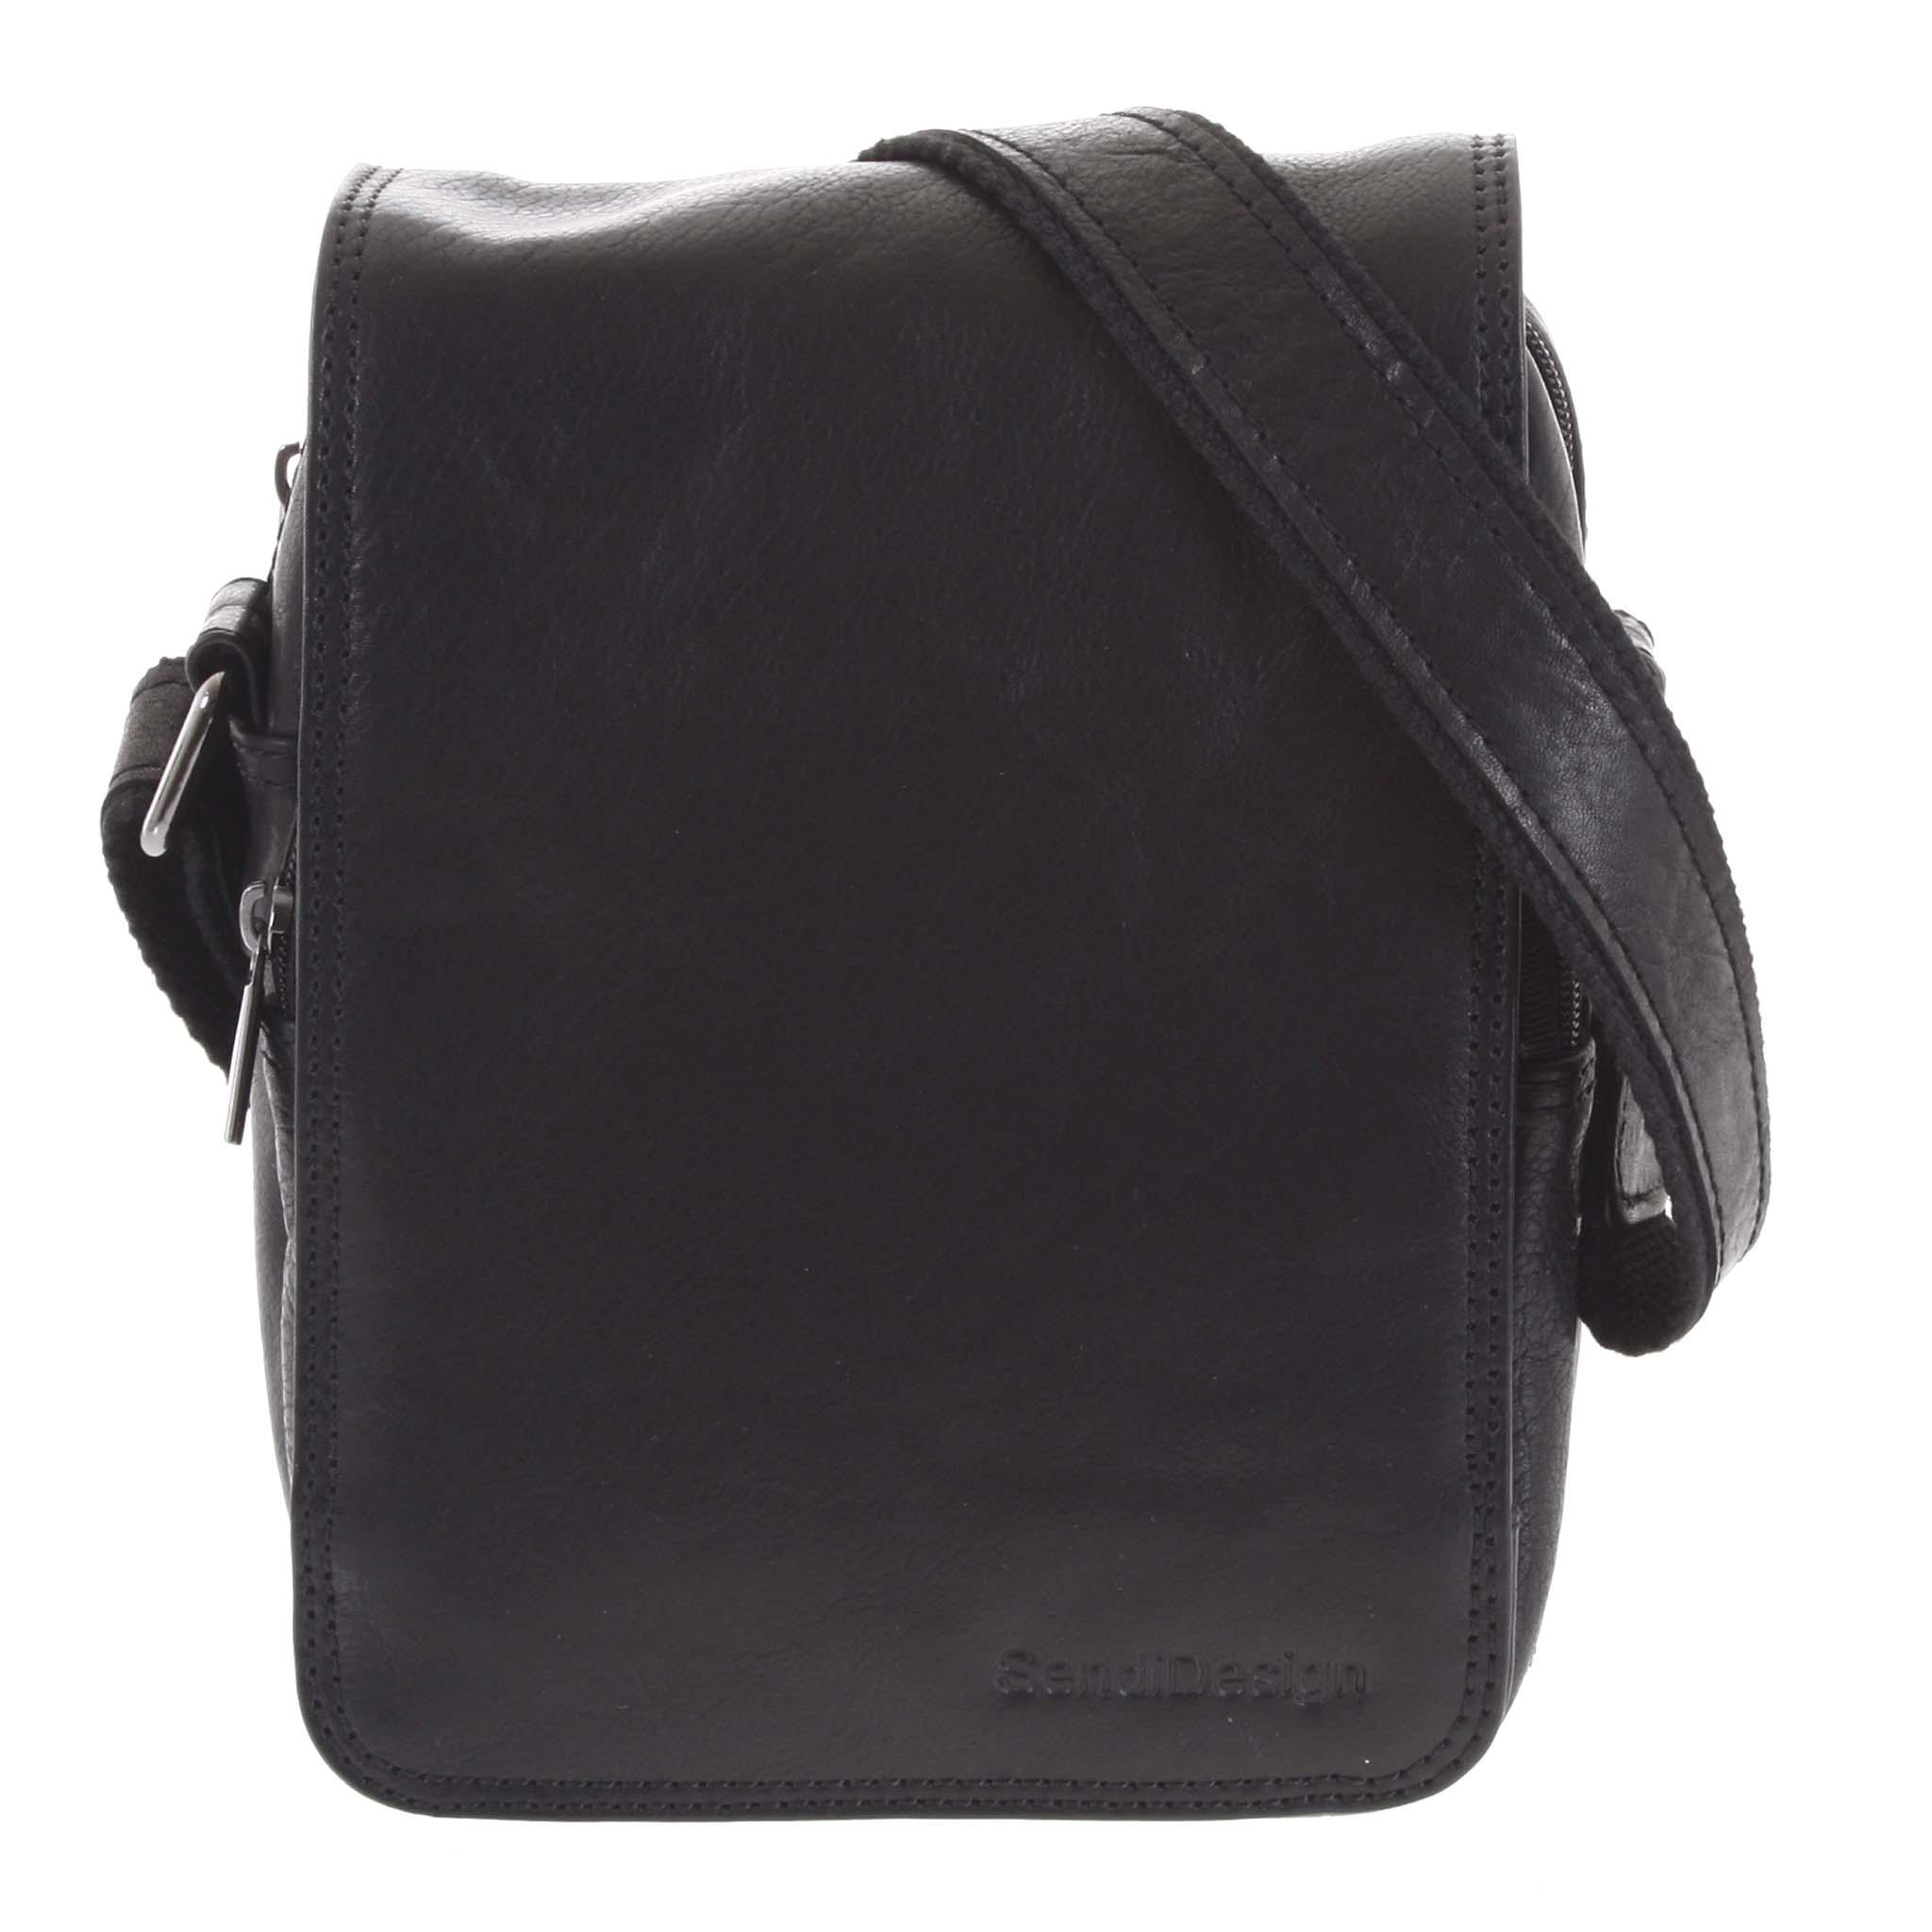 Pánská kožená taška přes rameno černá - SendiDesign Muxos